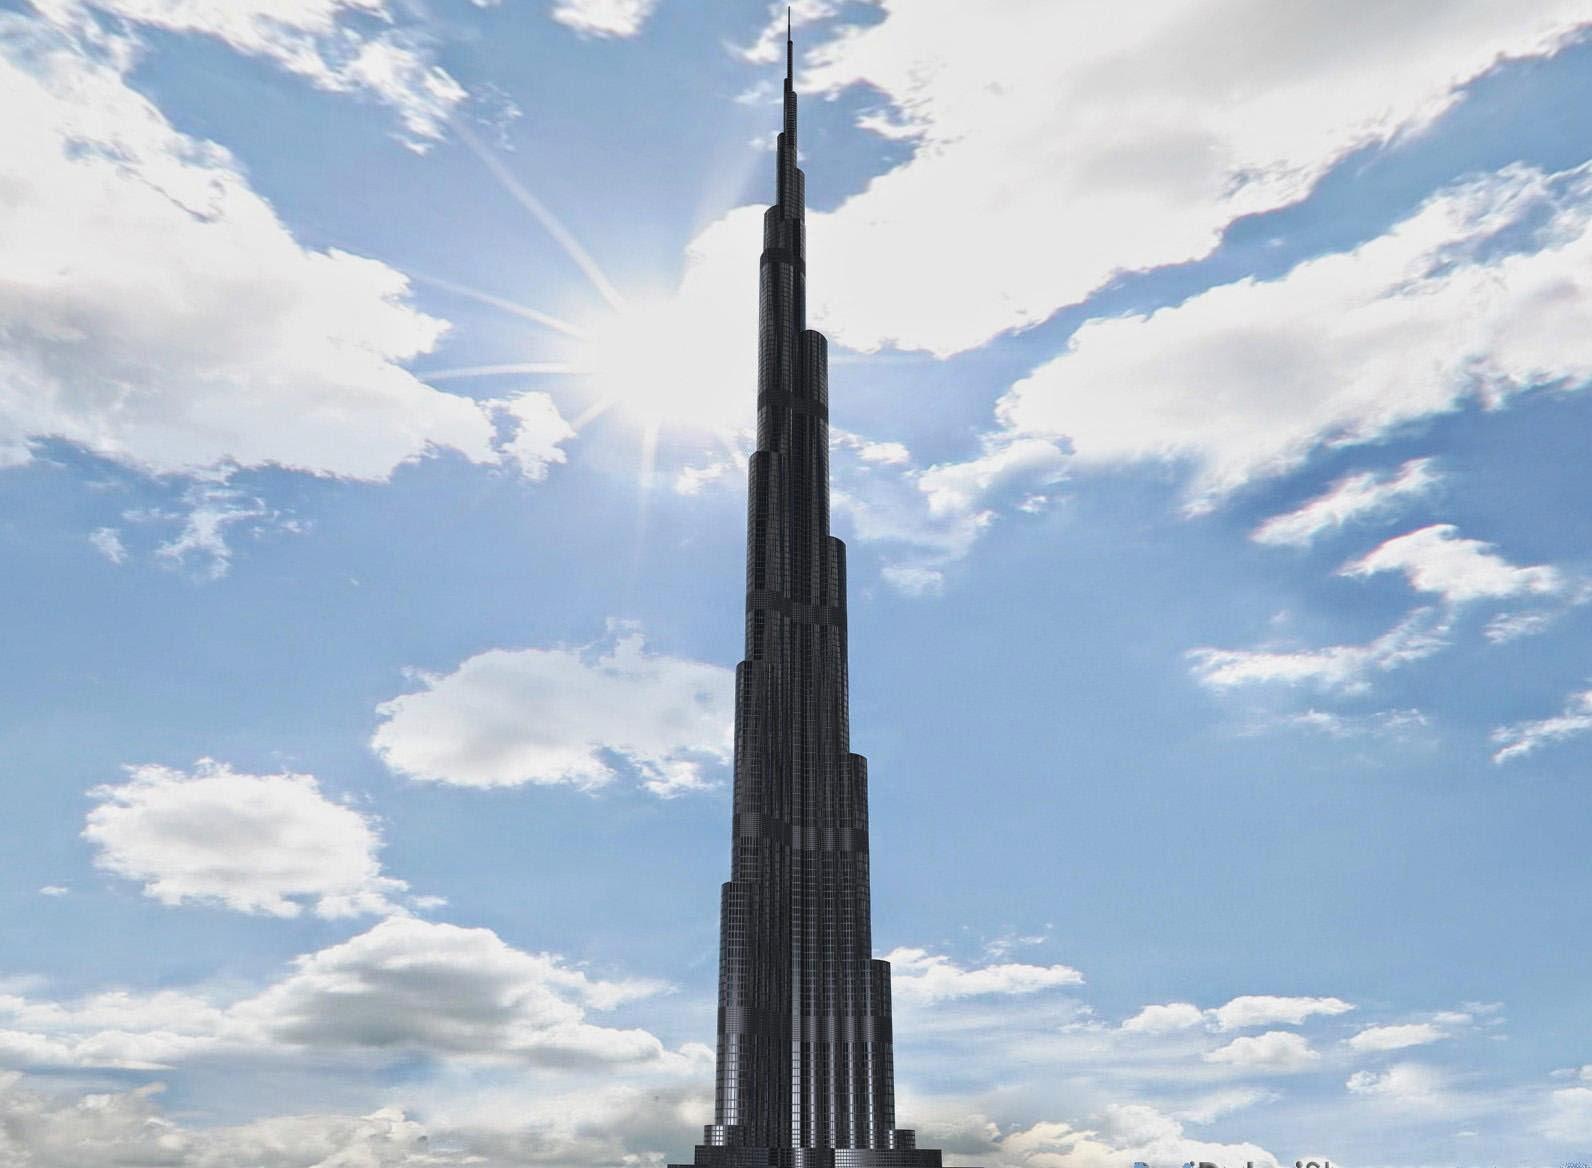 Burj Khalifa Hd WallpapersBurj Khalifa PicsBurj Khalifa ImagesWorld 1592x1168